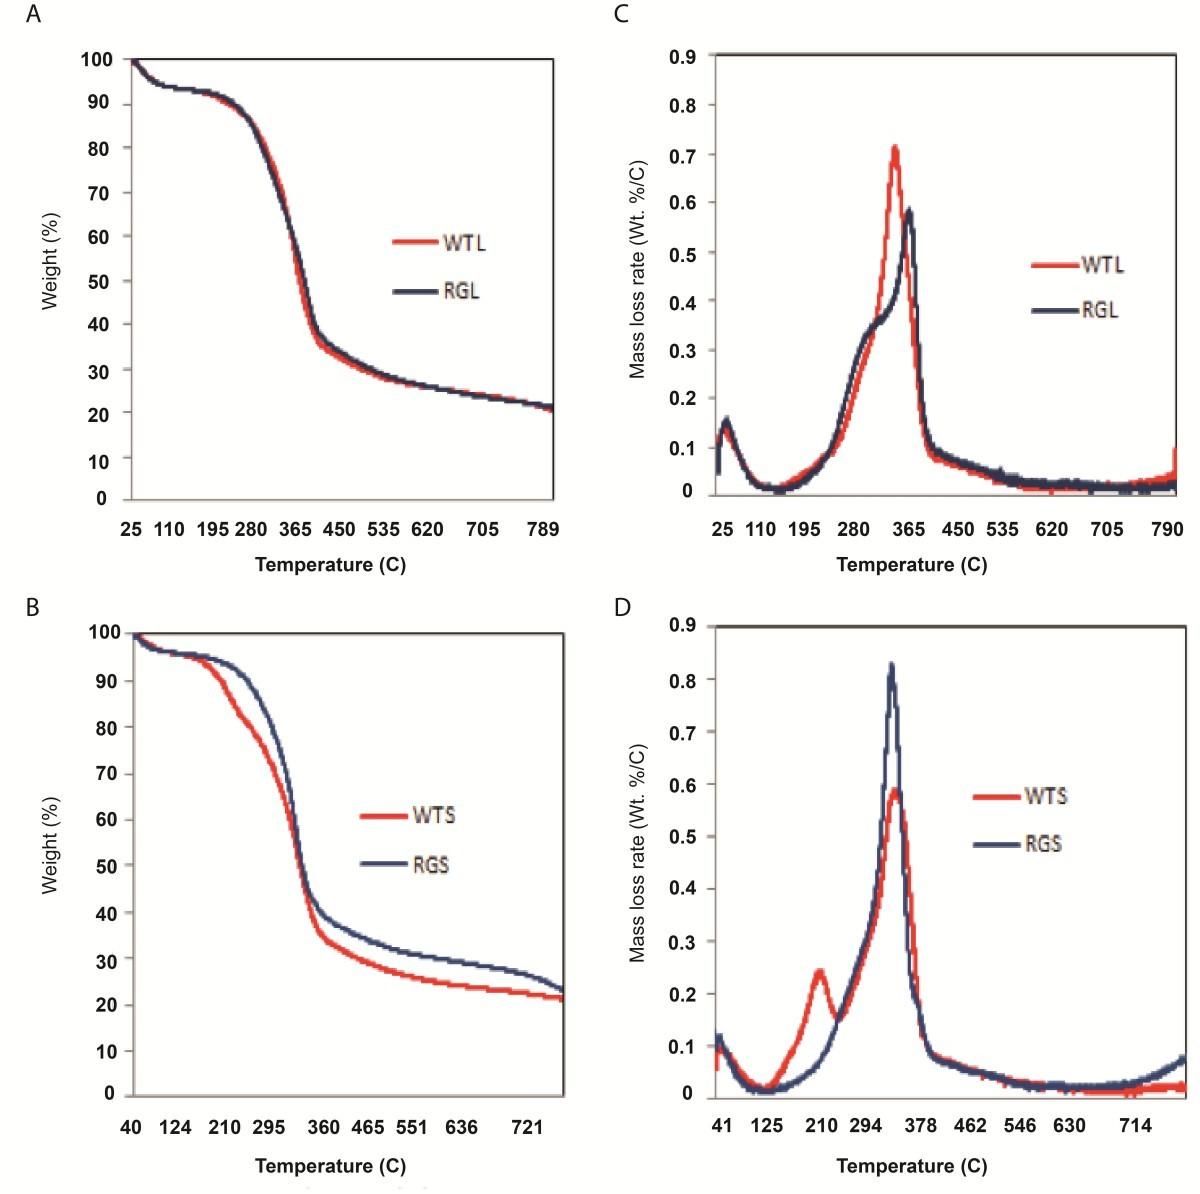 Sorghum Mutant Rgdisplays Antithetic Leaf Shoot Lignin Accumulation Sp Schematicjpg 630 Kb 2733 Views Figure 7